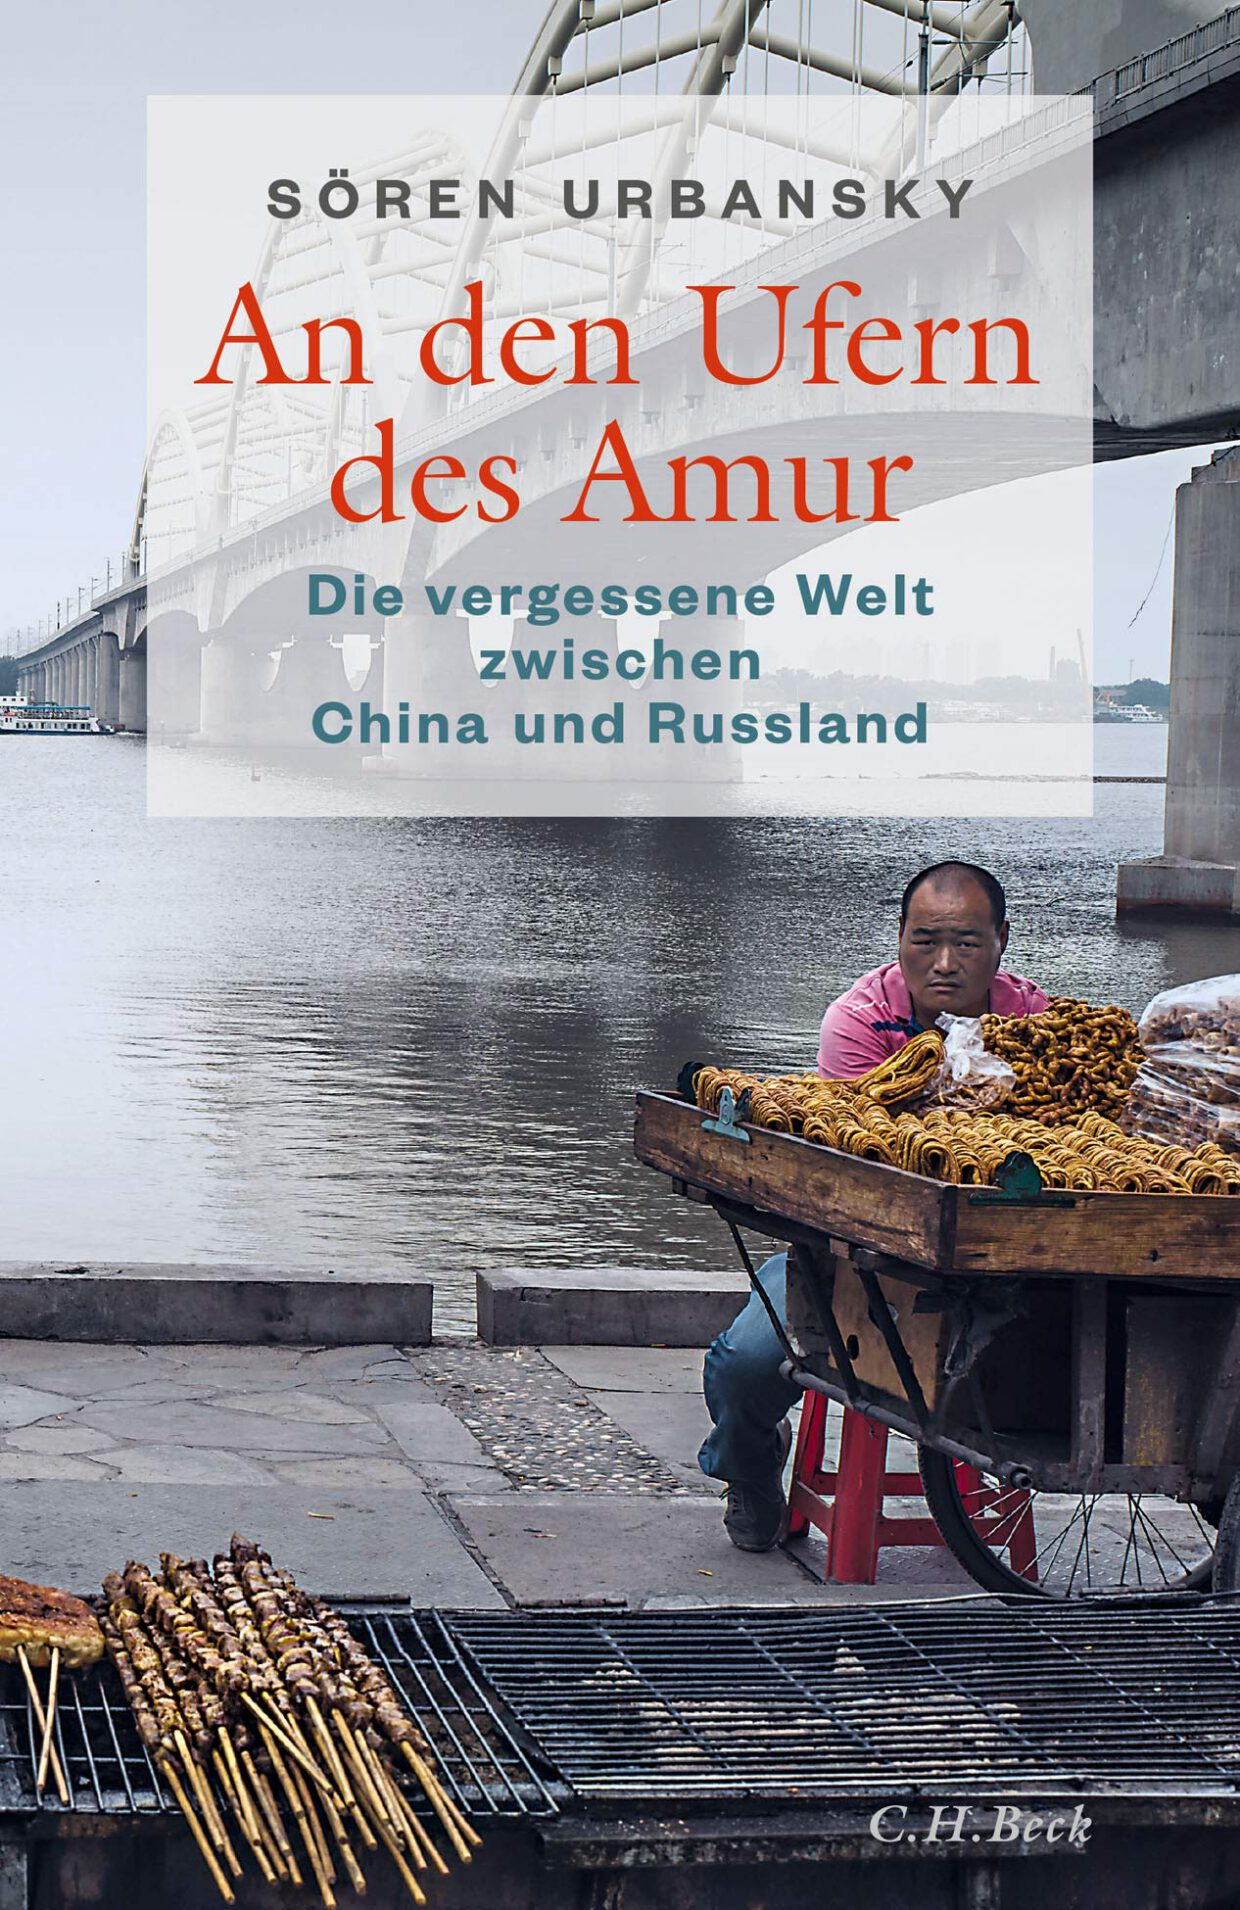 Sören Urbansky: An den Ufern des Amur